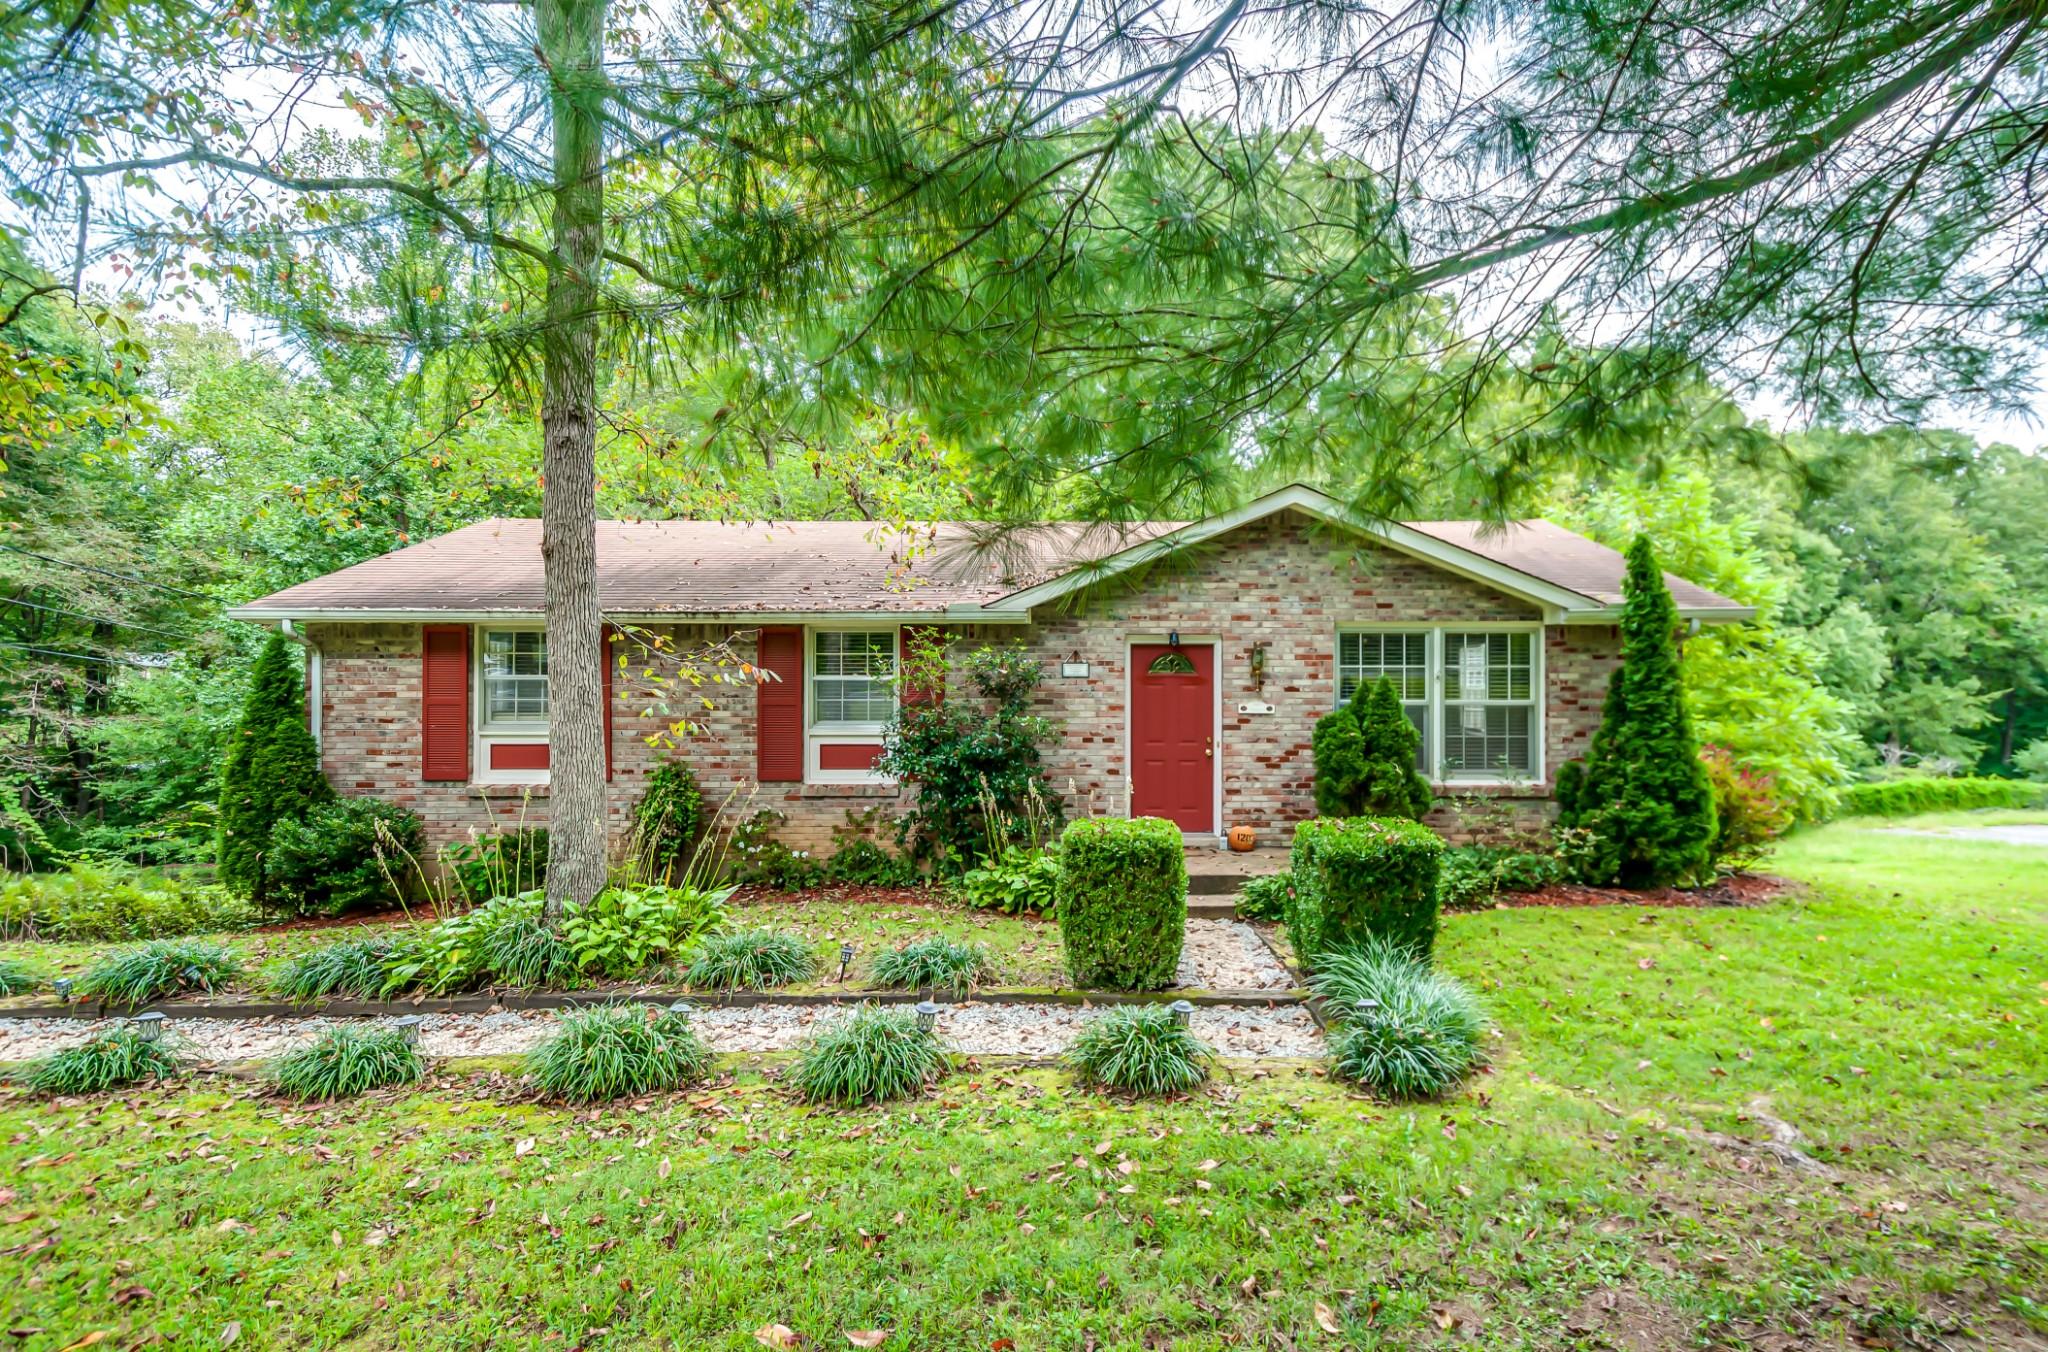 1203 Kingston Springs Rd Property Photo - Kingston Springs, TN real estate listing